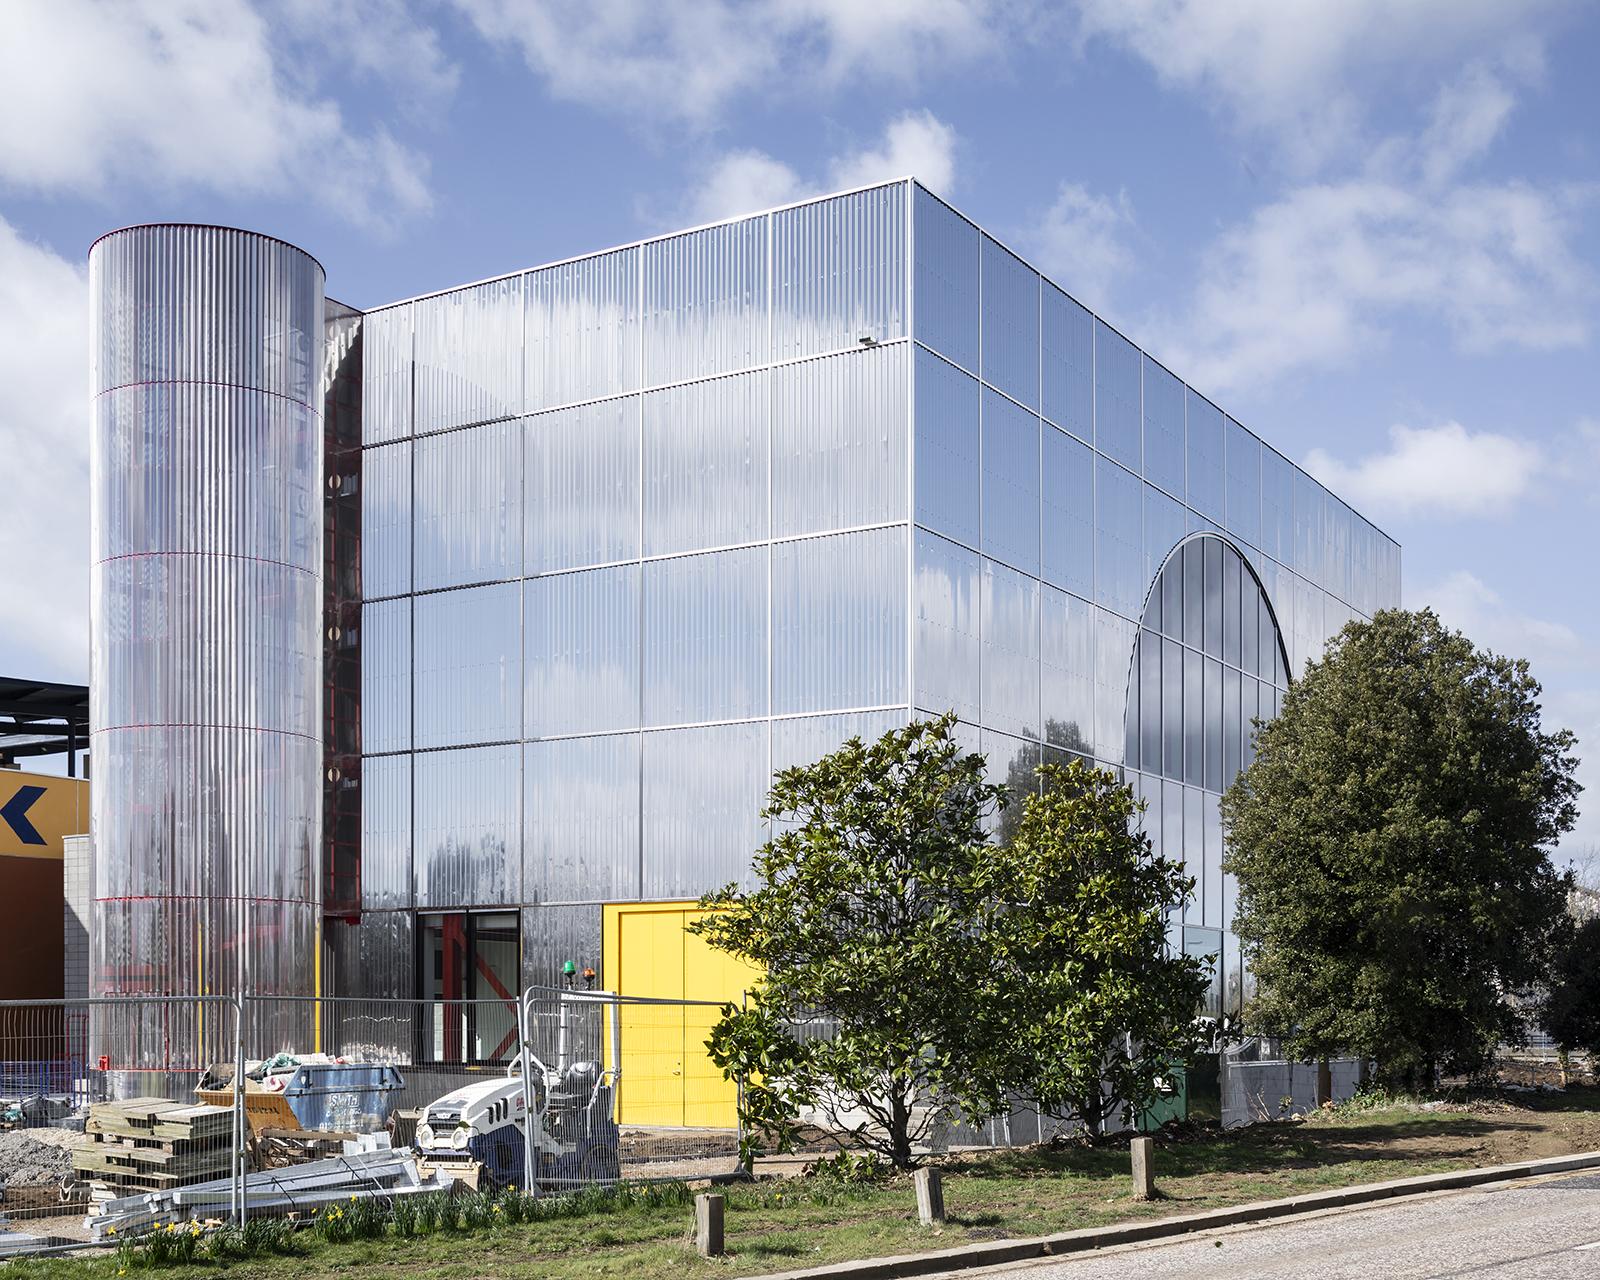 24_MK-Gallery-photo-Johan Dehlin.jpg